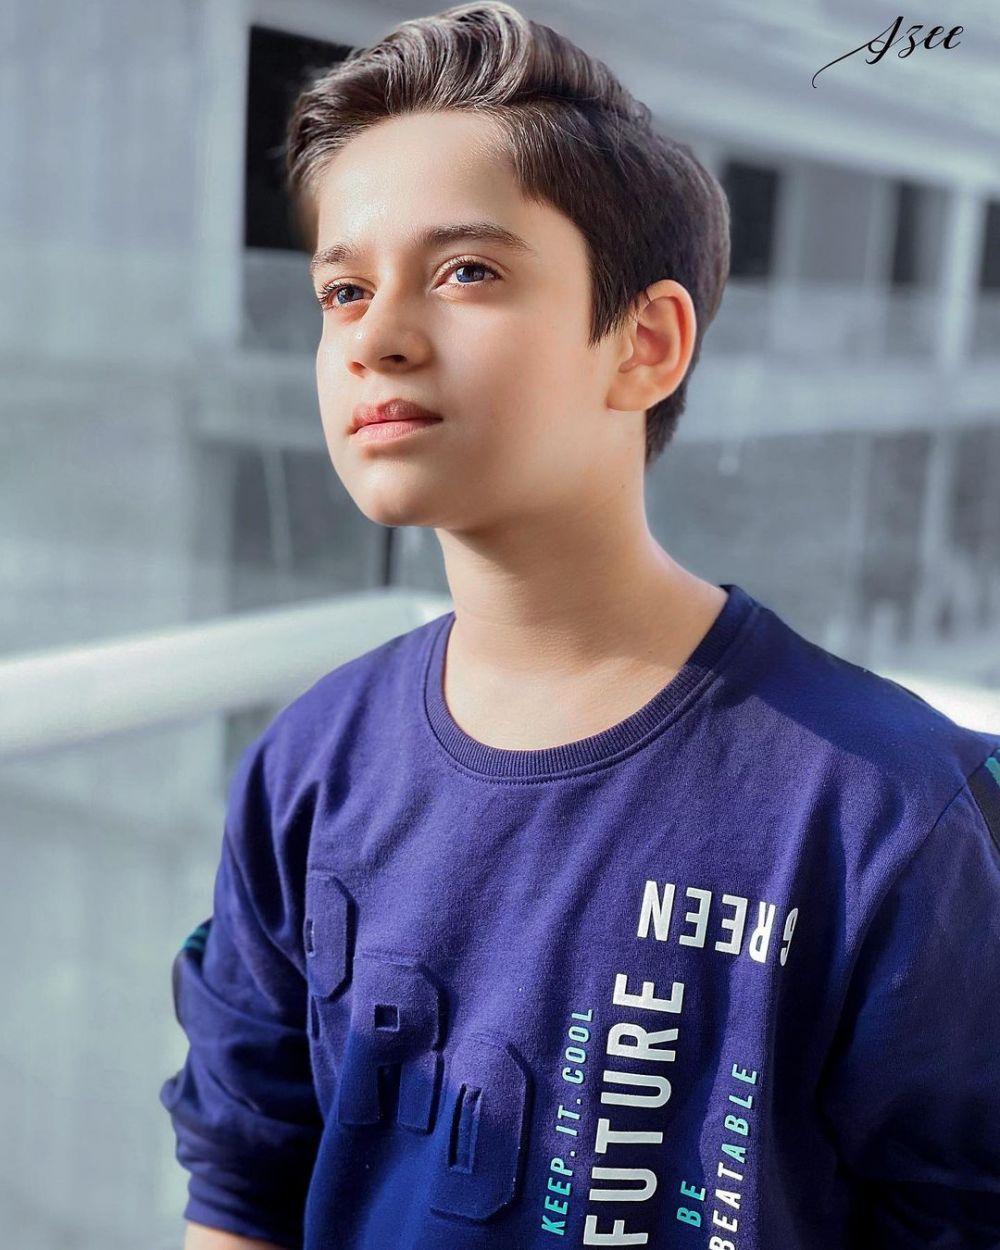 Kabar Ayaan Zubair pemeran Salim kecil di serial Jodha Akbar © 2020 brilio.net Instagram